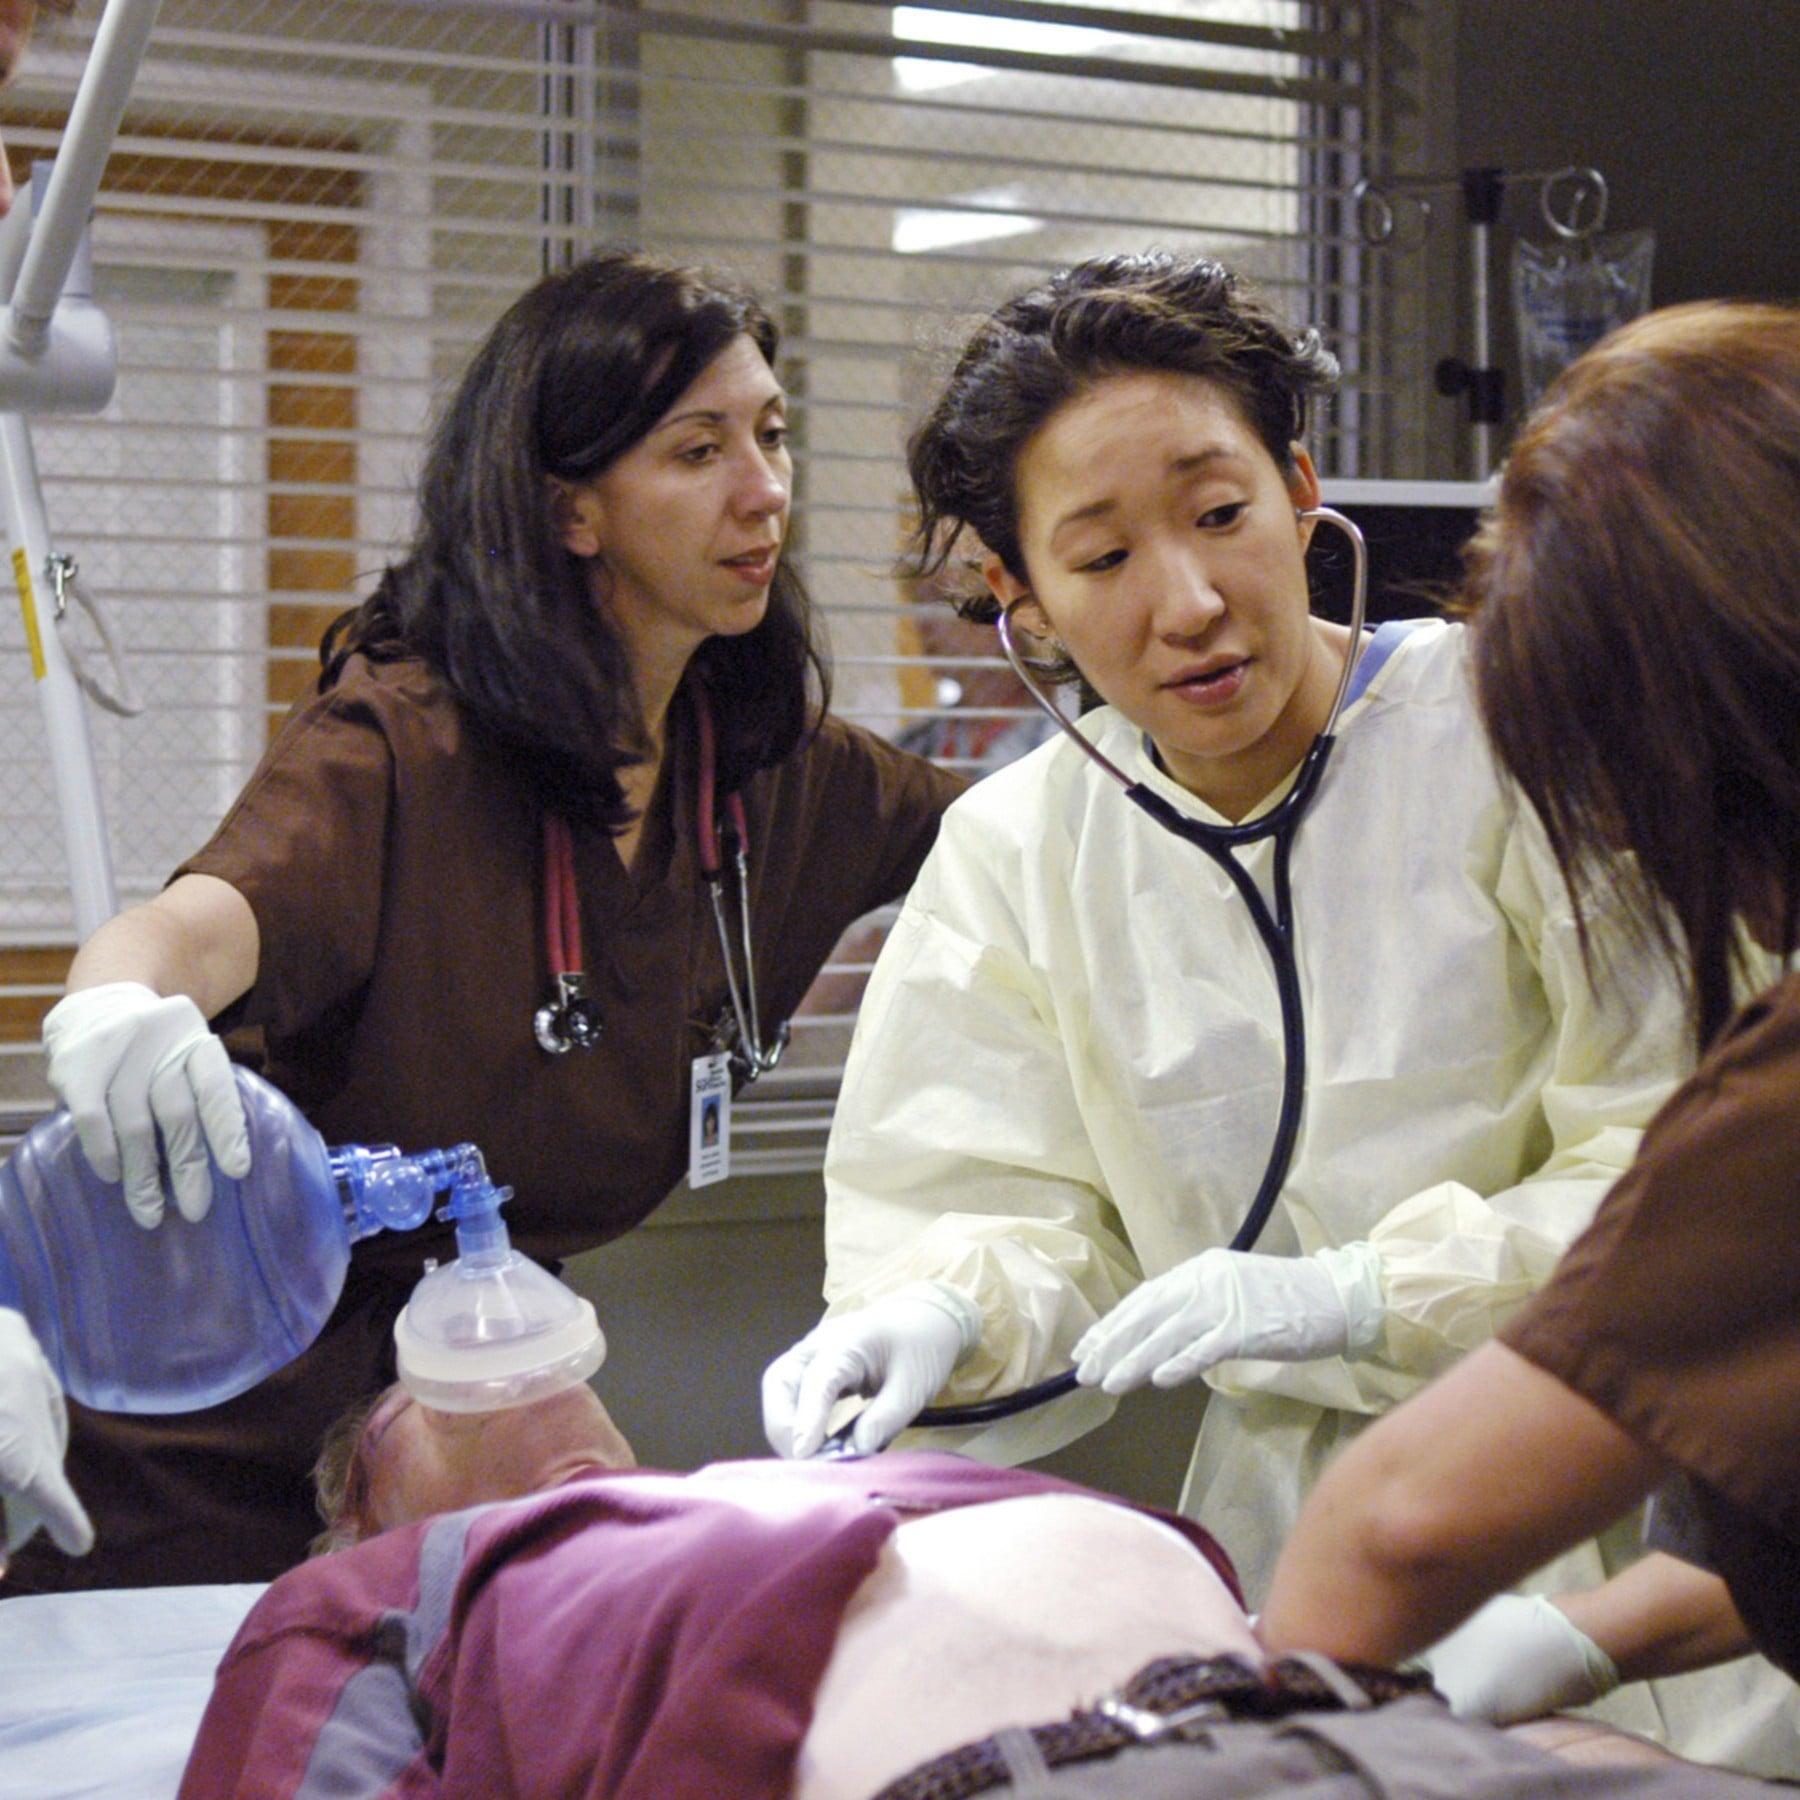 Grey's Anatomy: The Worst Episode From Each Season 1 Through 8, According To IMDb